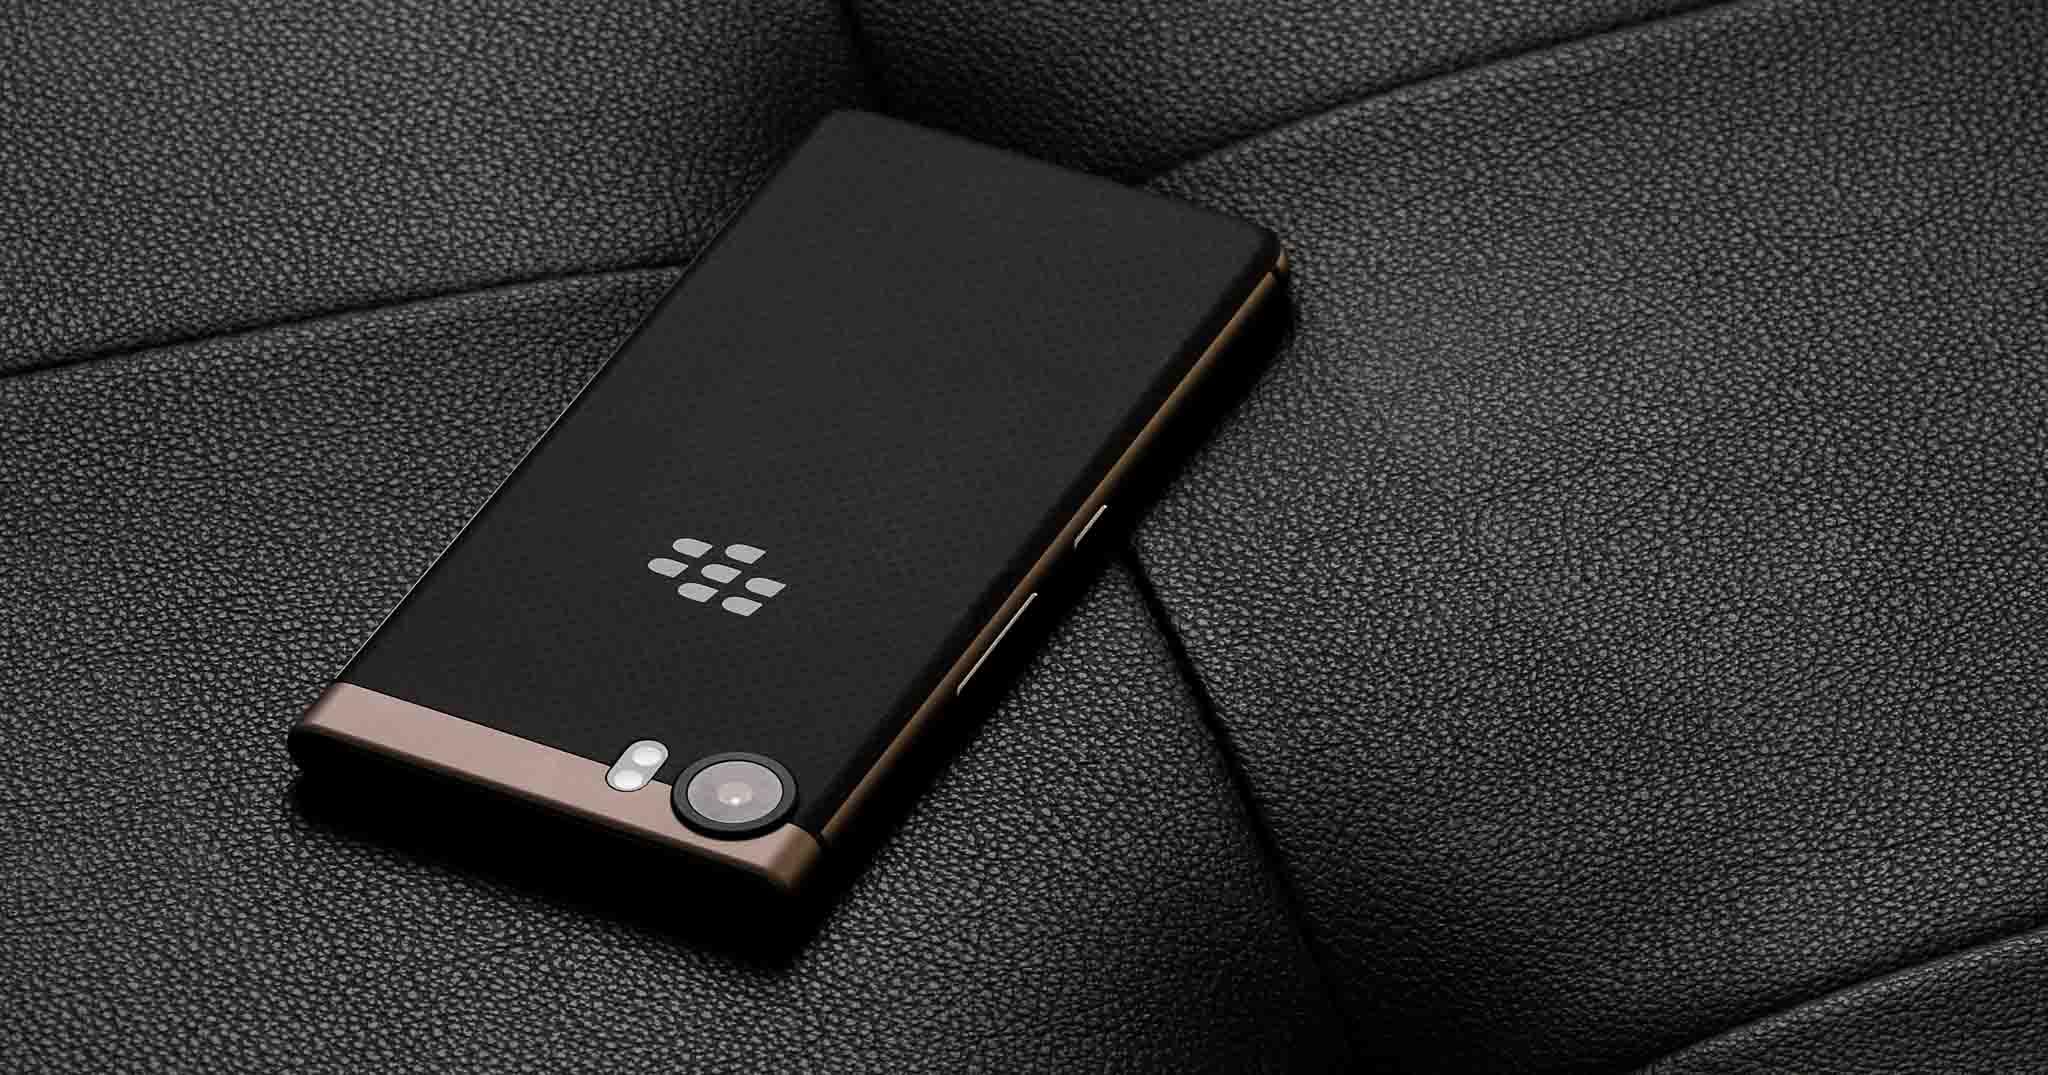 C_mo_hop_blackberry_keyone_bronze_edition.jpg